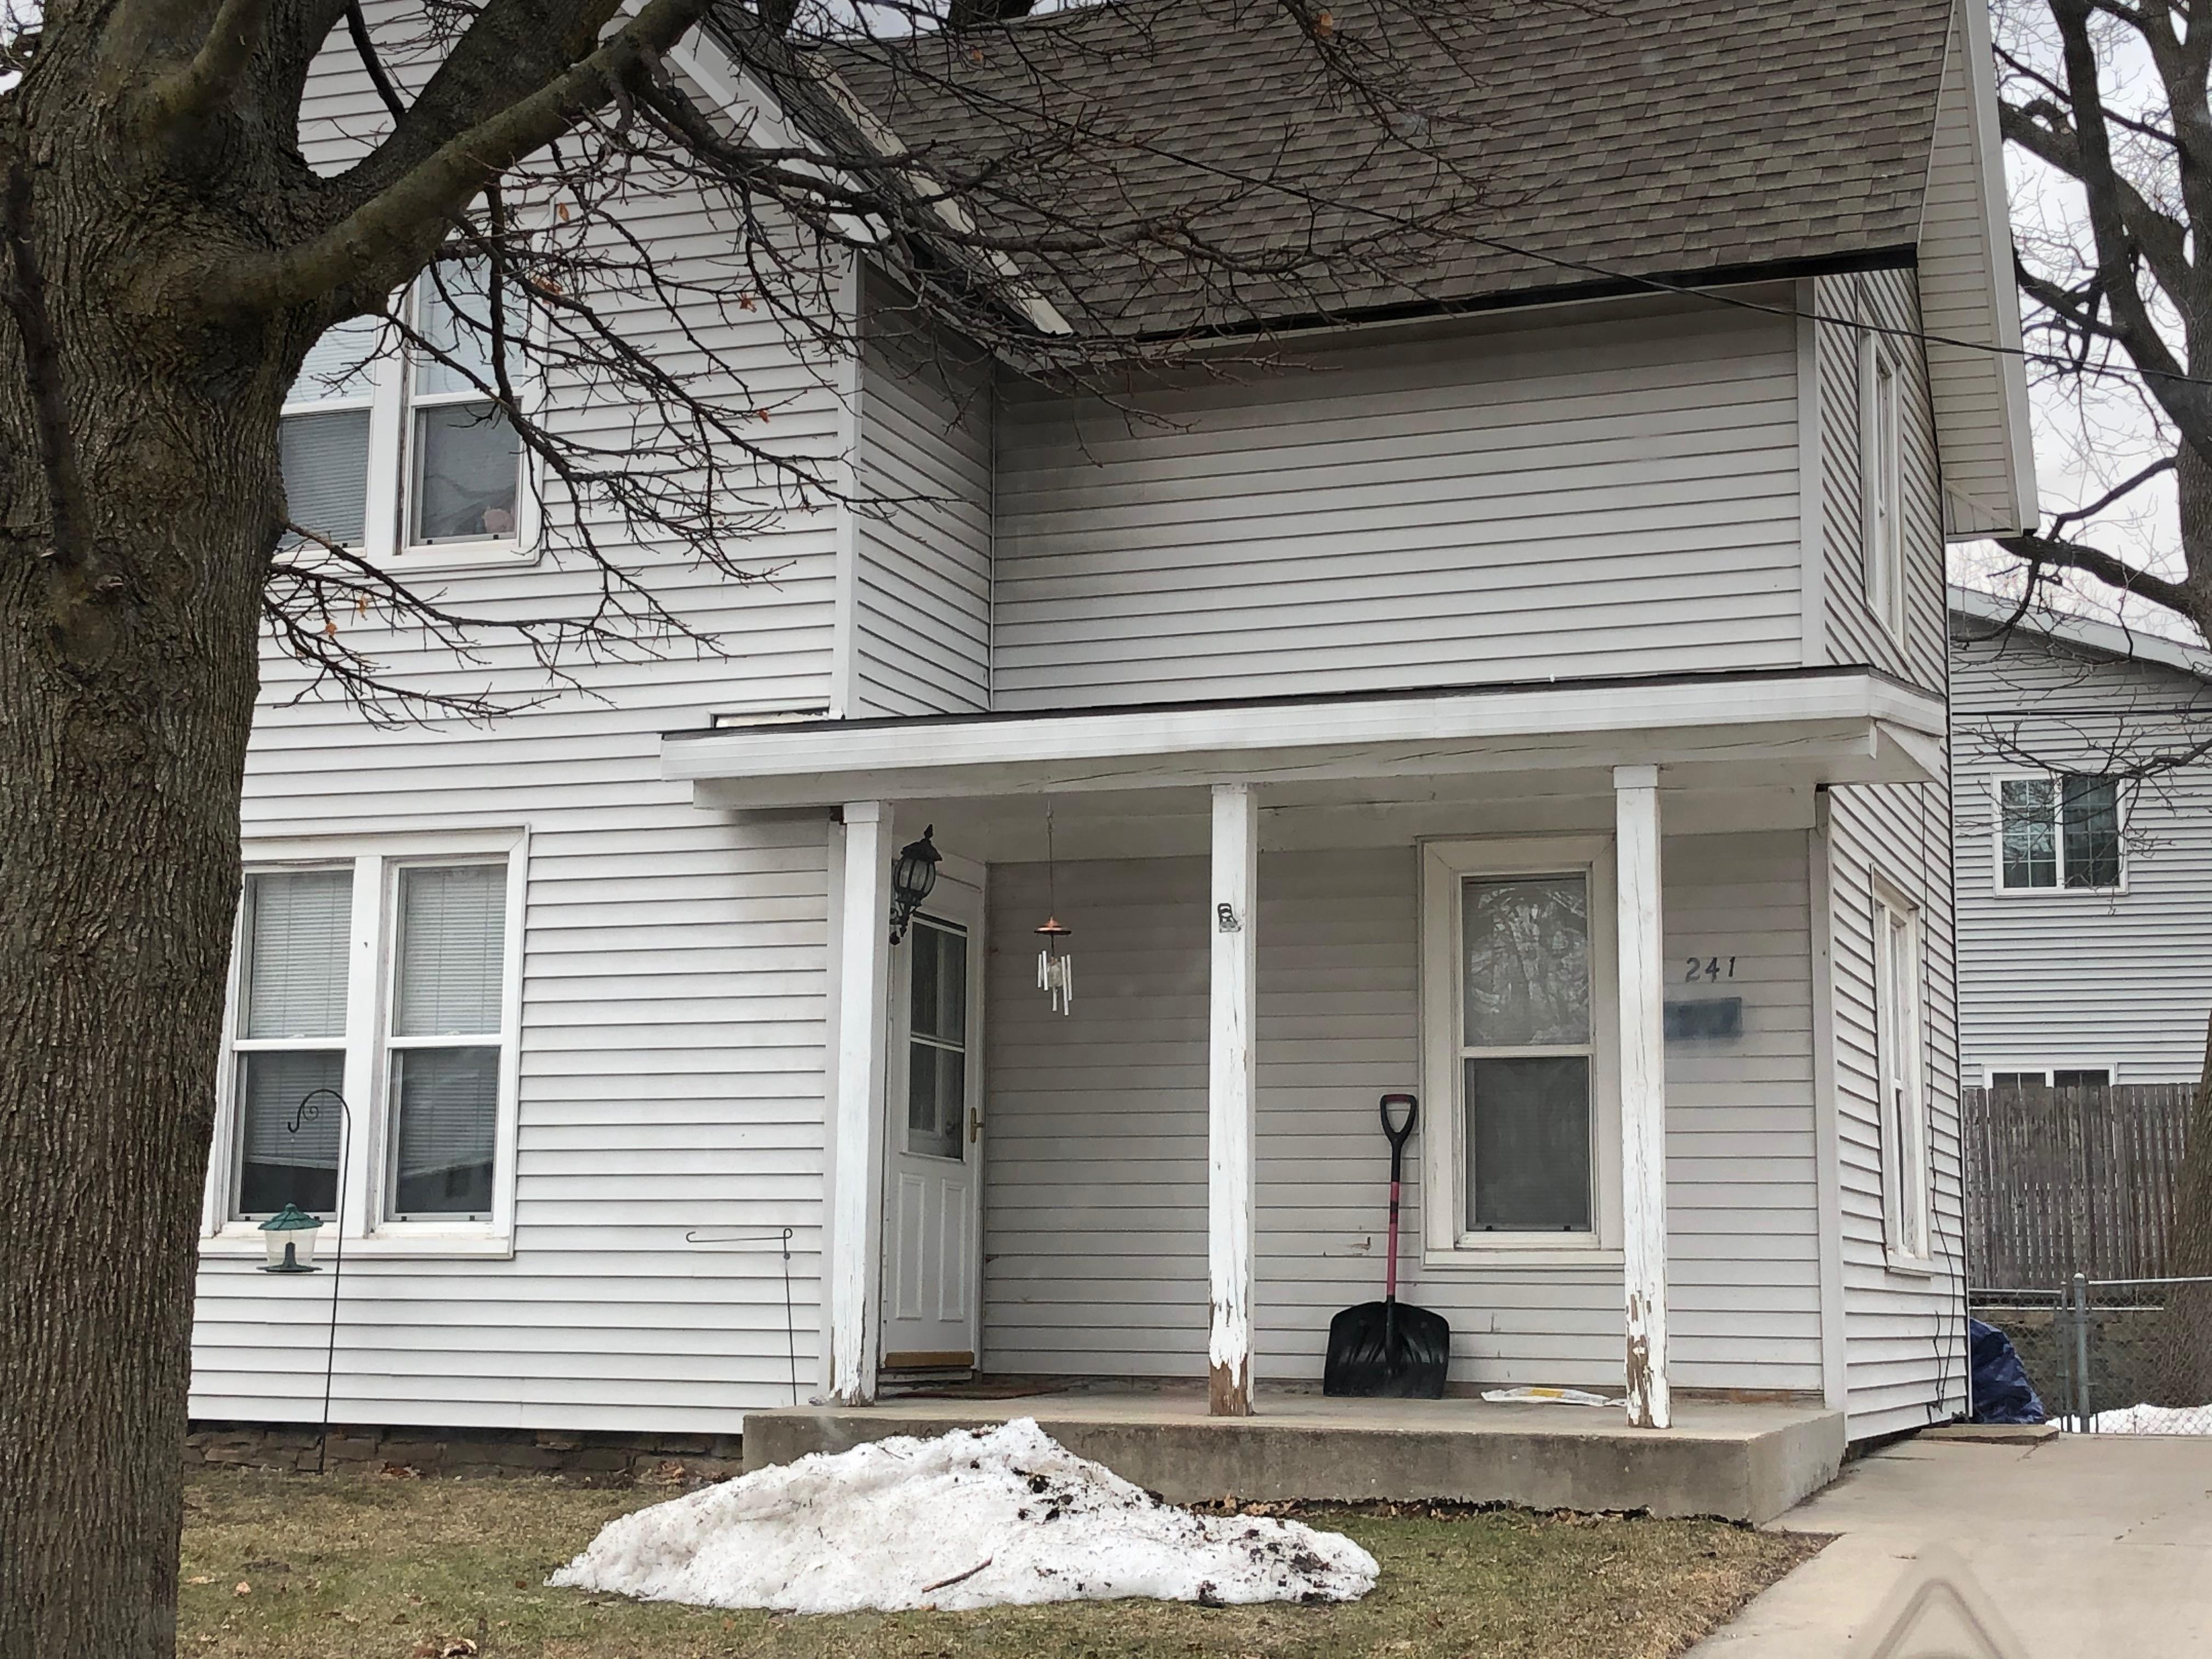 Ernest Kline's childhood home in 2020